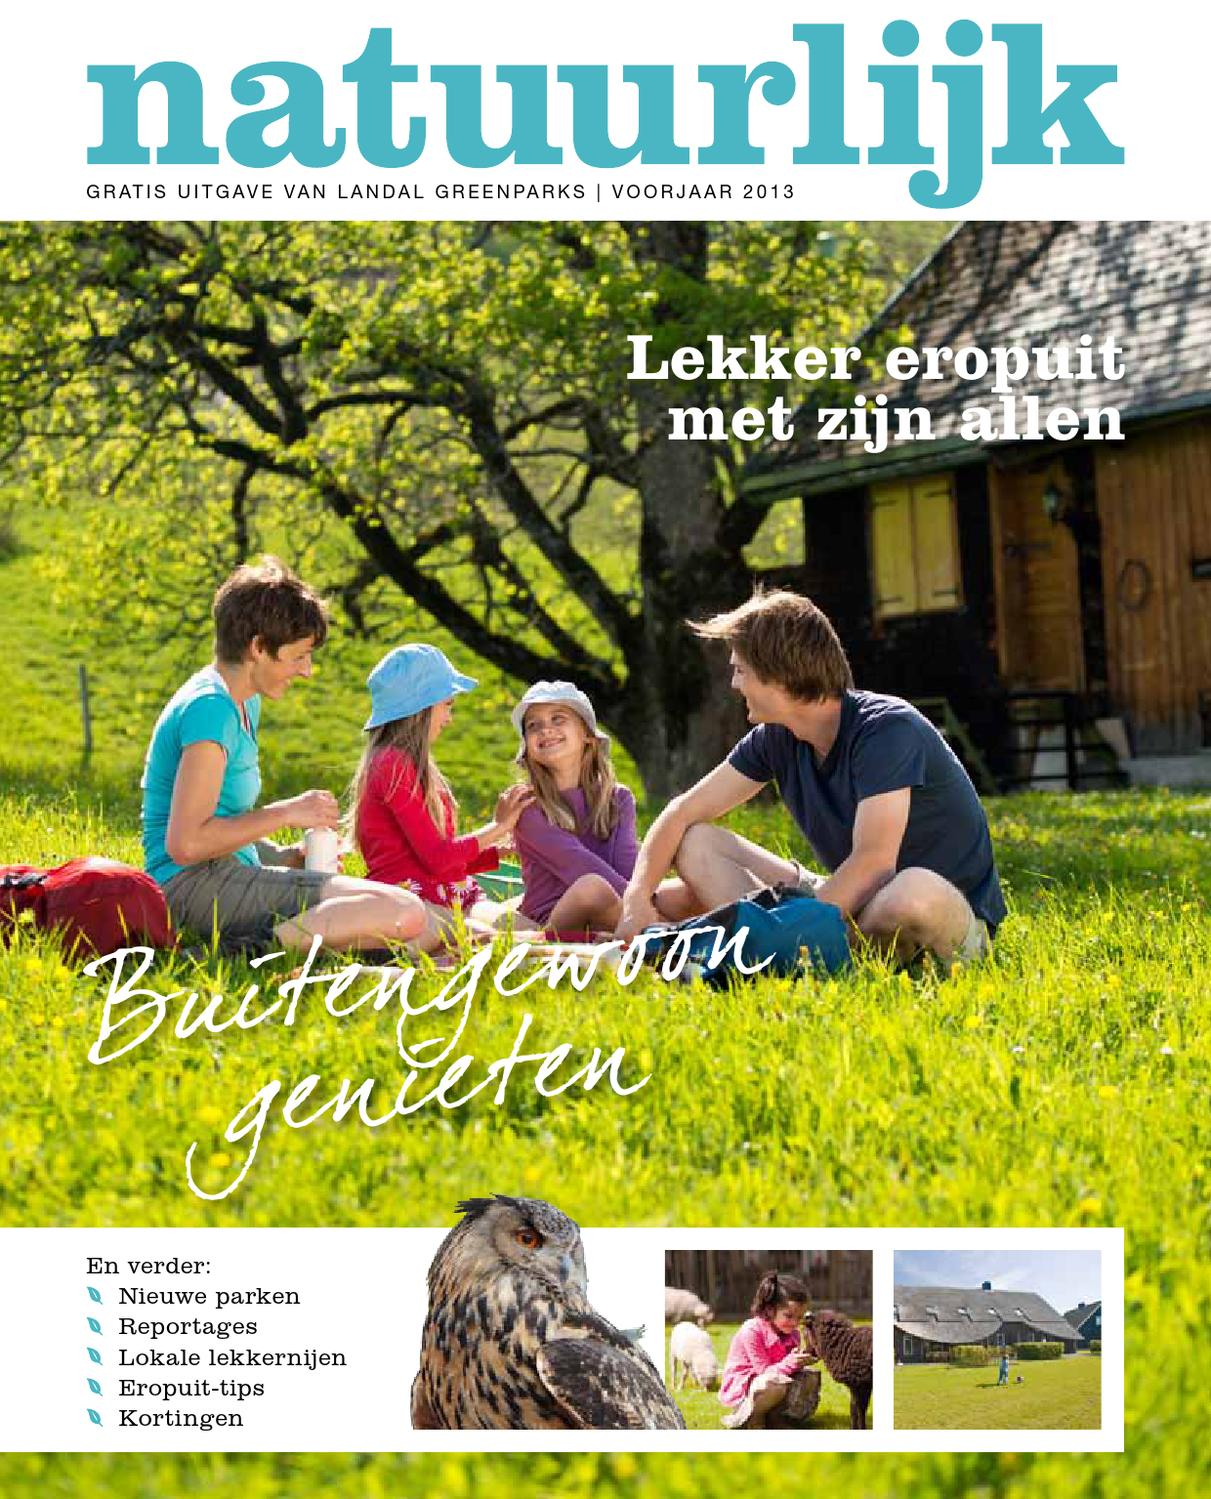 Natuurlijk voorjaar 2015 - Landal GreenParks by Landal GreenParks ...